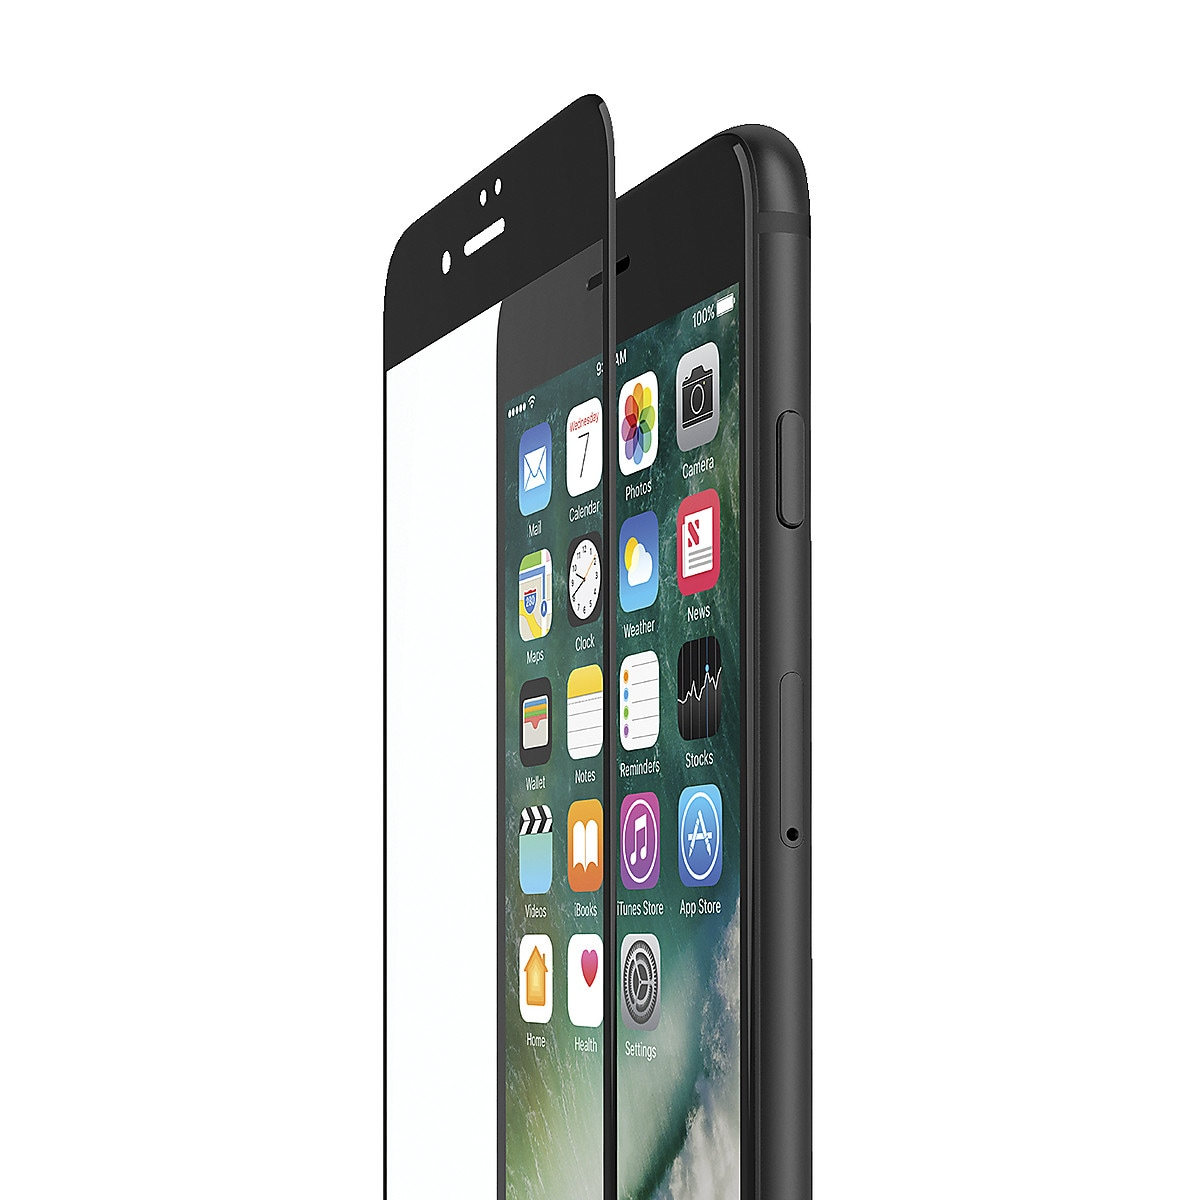 Skärmskydd för iPhone 8 Belkin Screenforce TemperedCurve